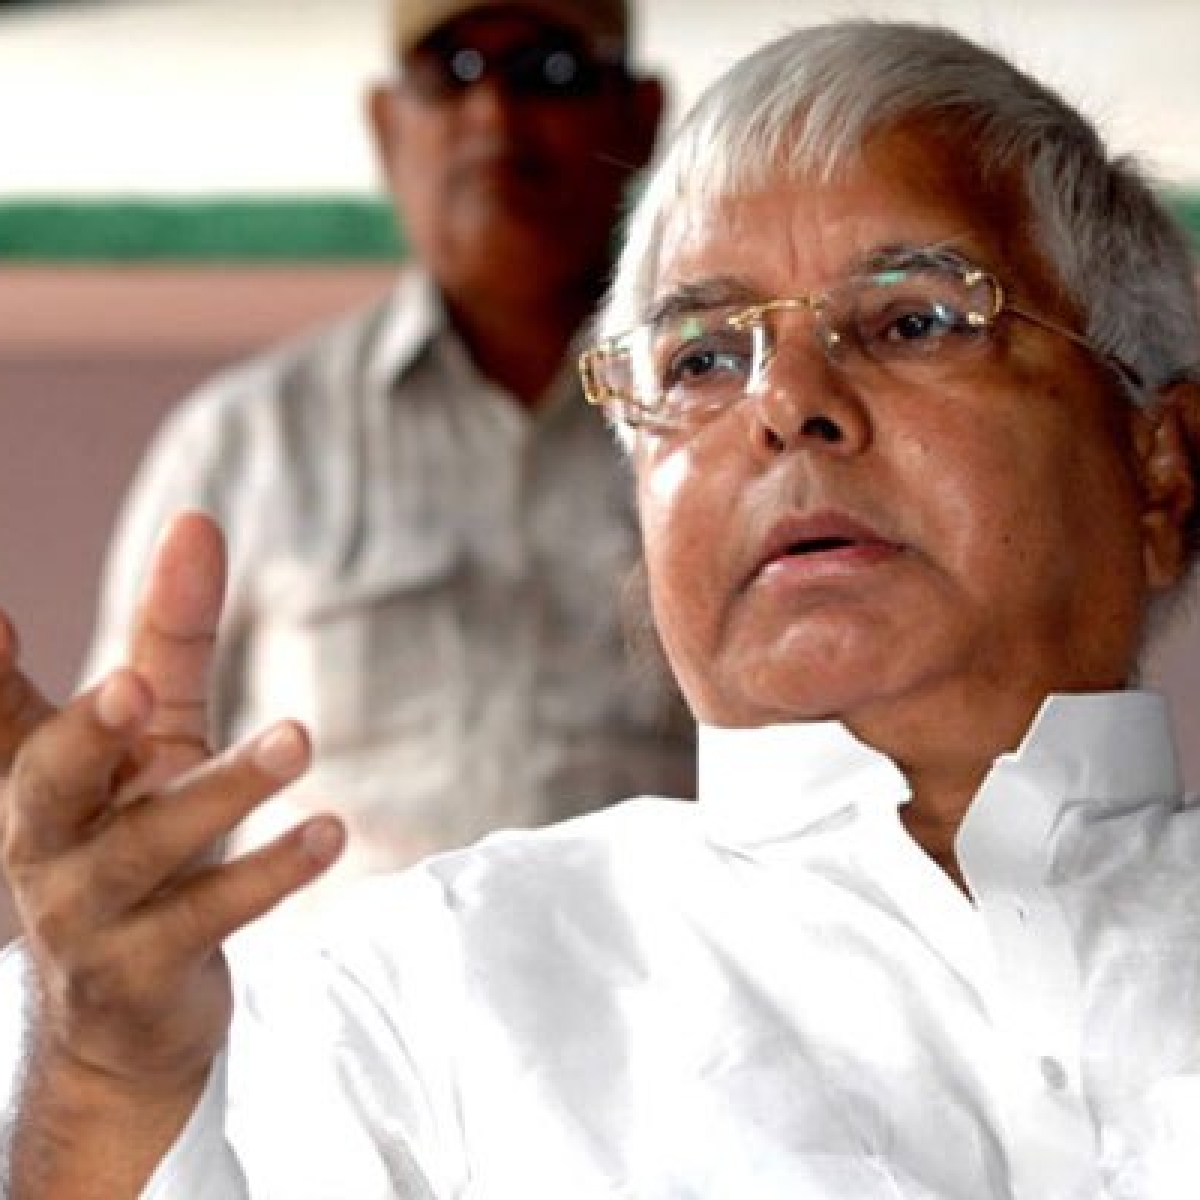 Bihar: RJD president Lalu Prasad Yadav's oxygen level drops during video conference, meeting suspended